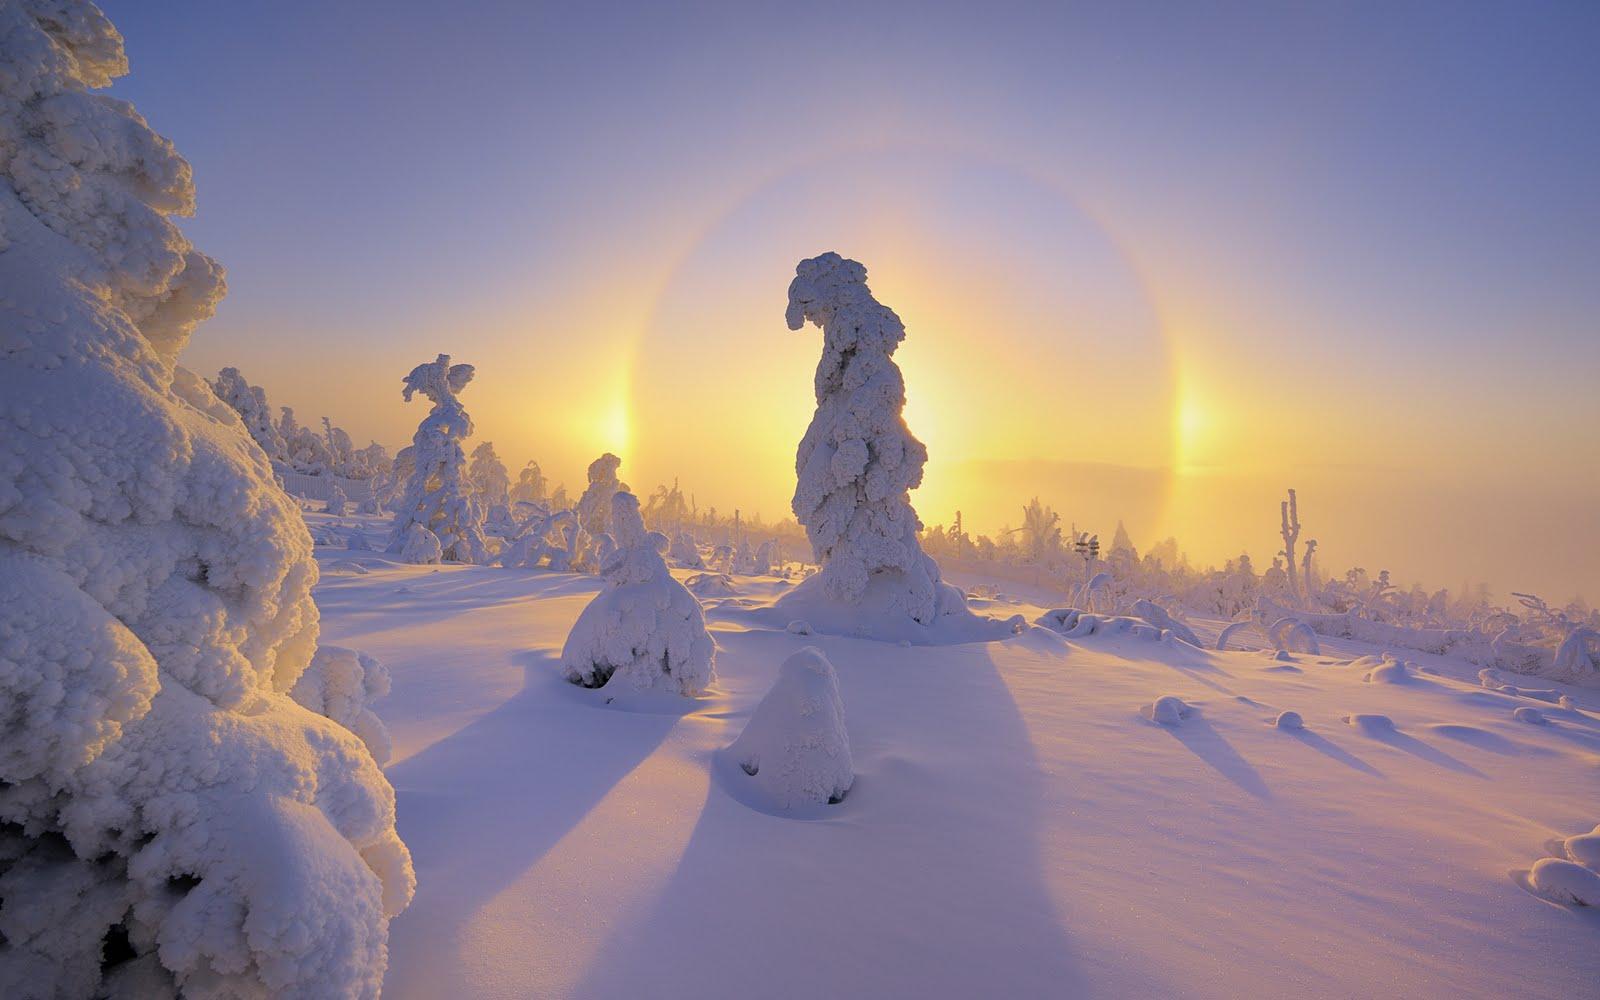 scenic winter beautiful wallpapers - photo #25